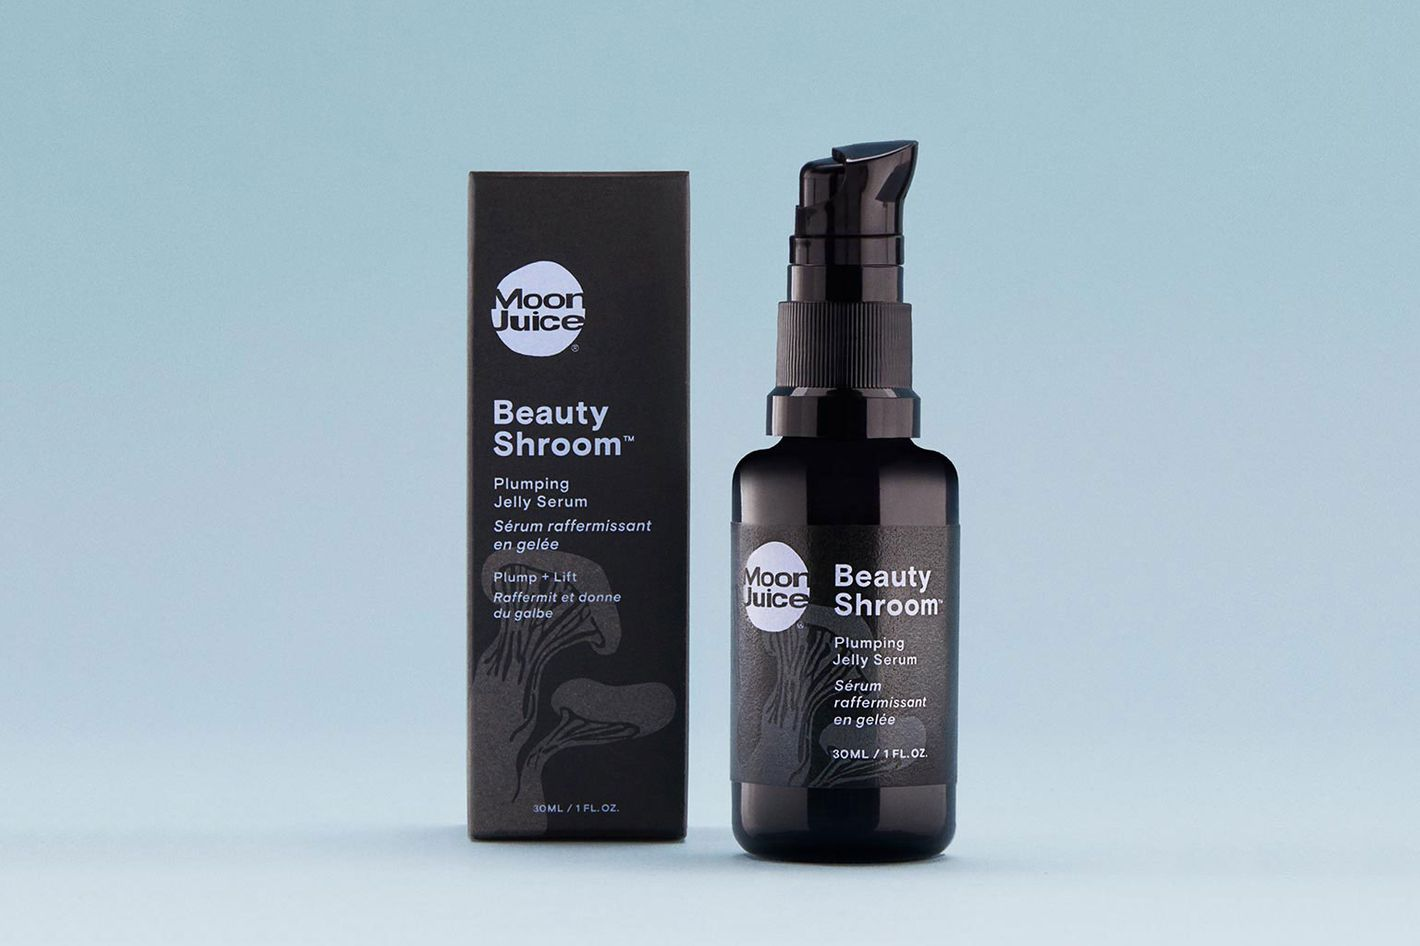 MOON JUICE Beauty Shroom™ Plumping Jelly Serum